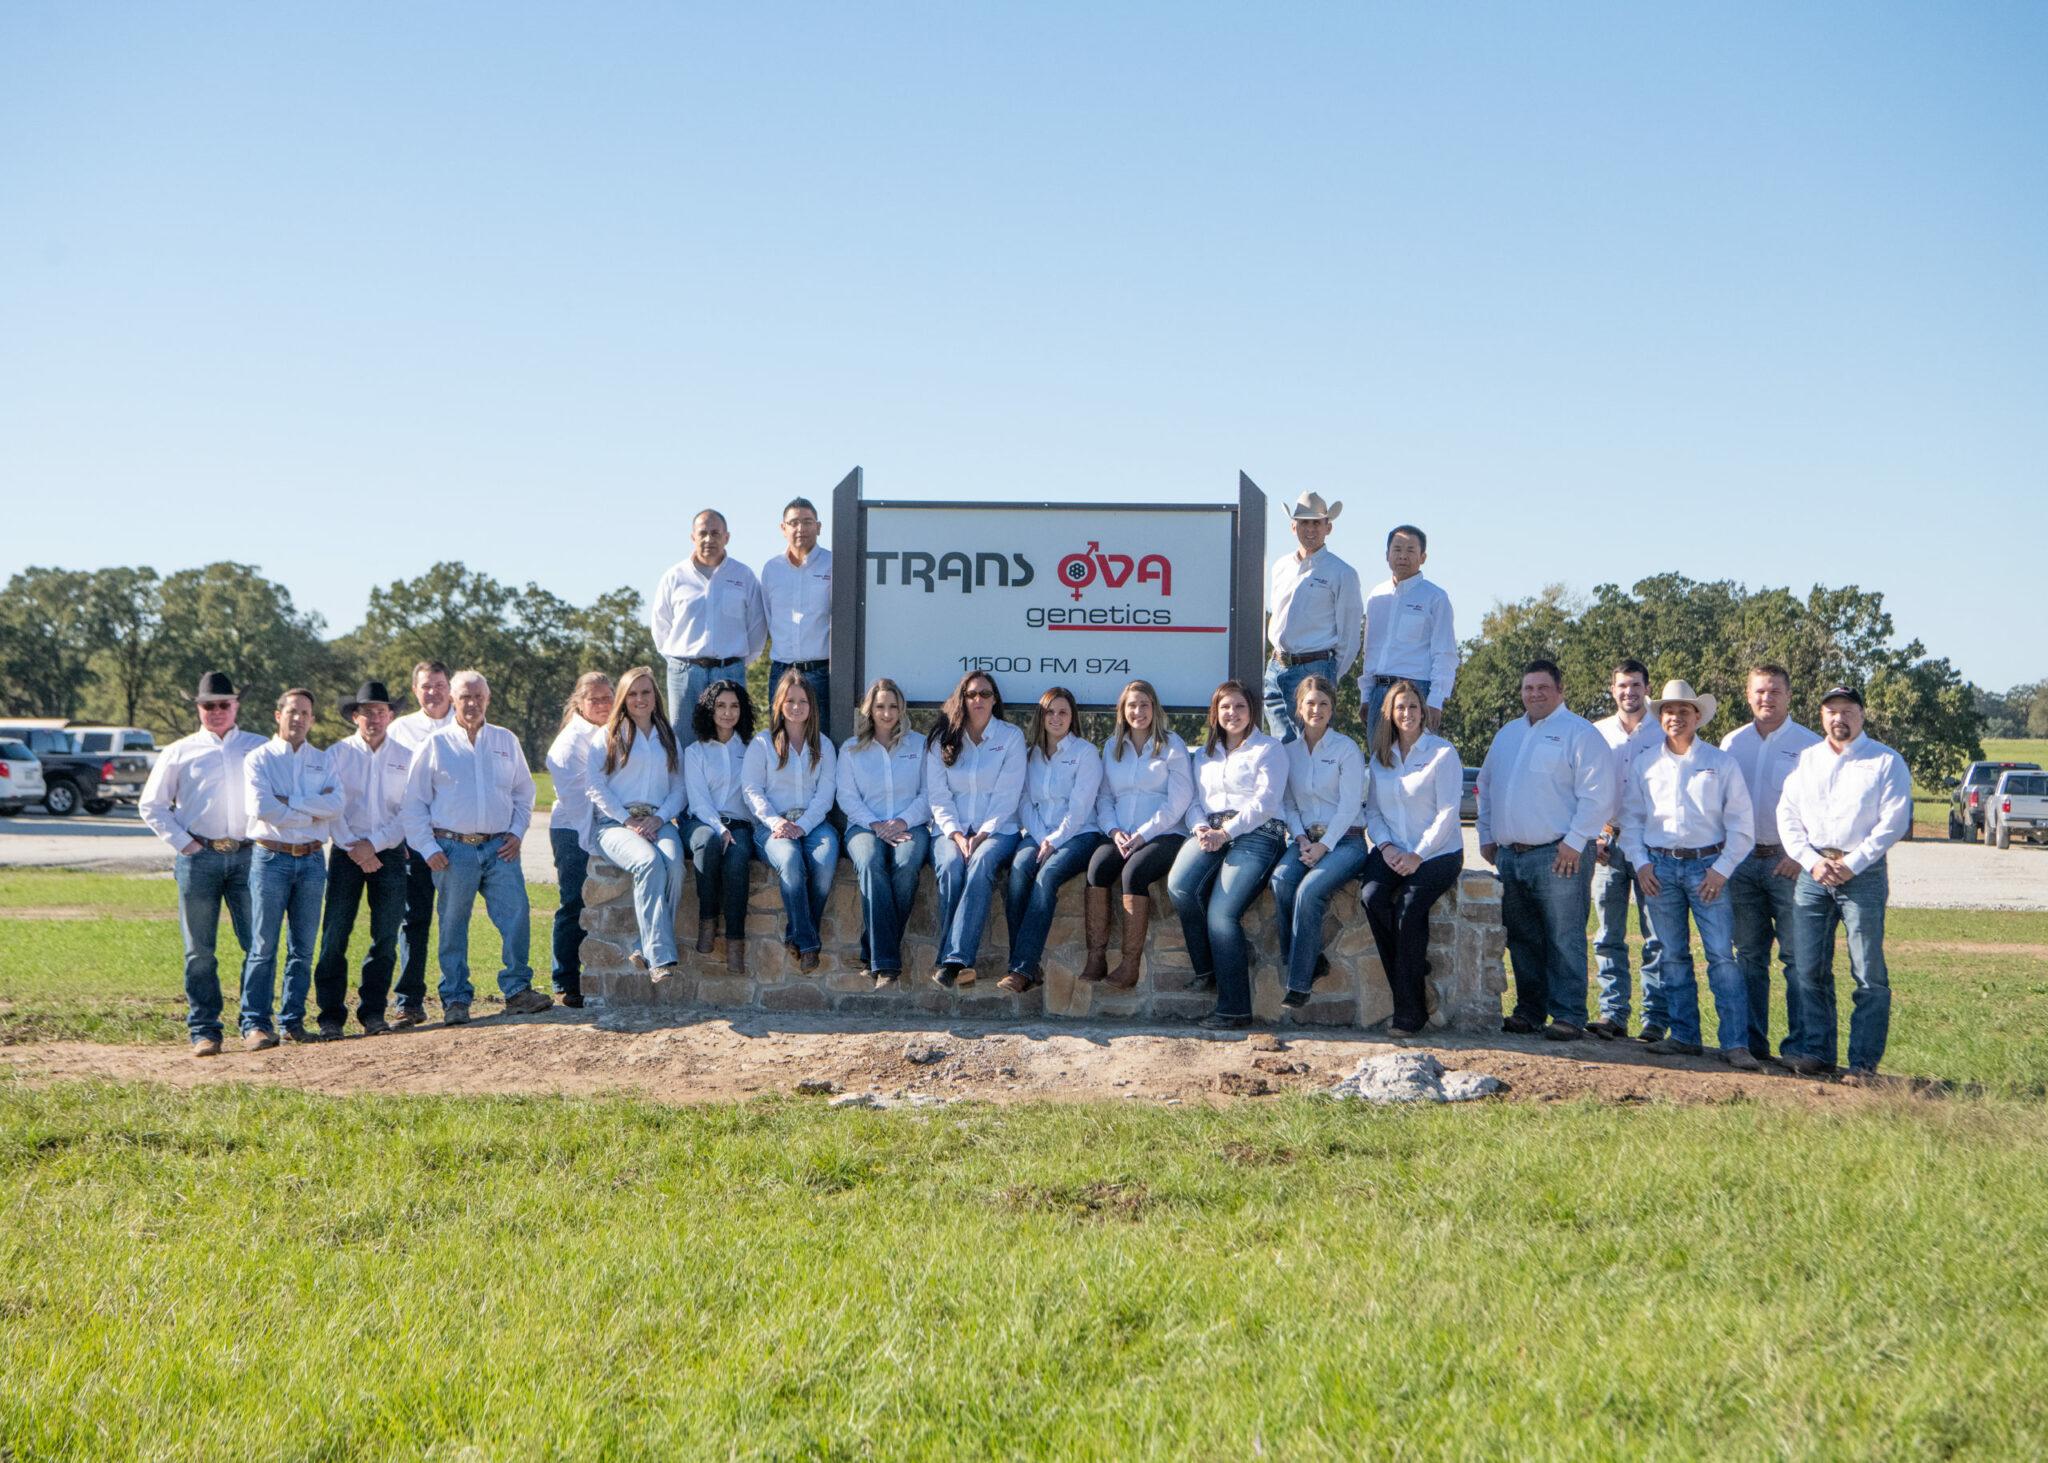 Trans Ova Texas – New Facilities, Same Great Team!